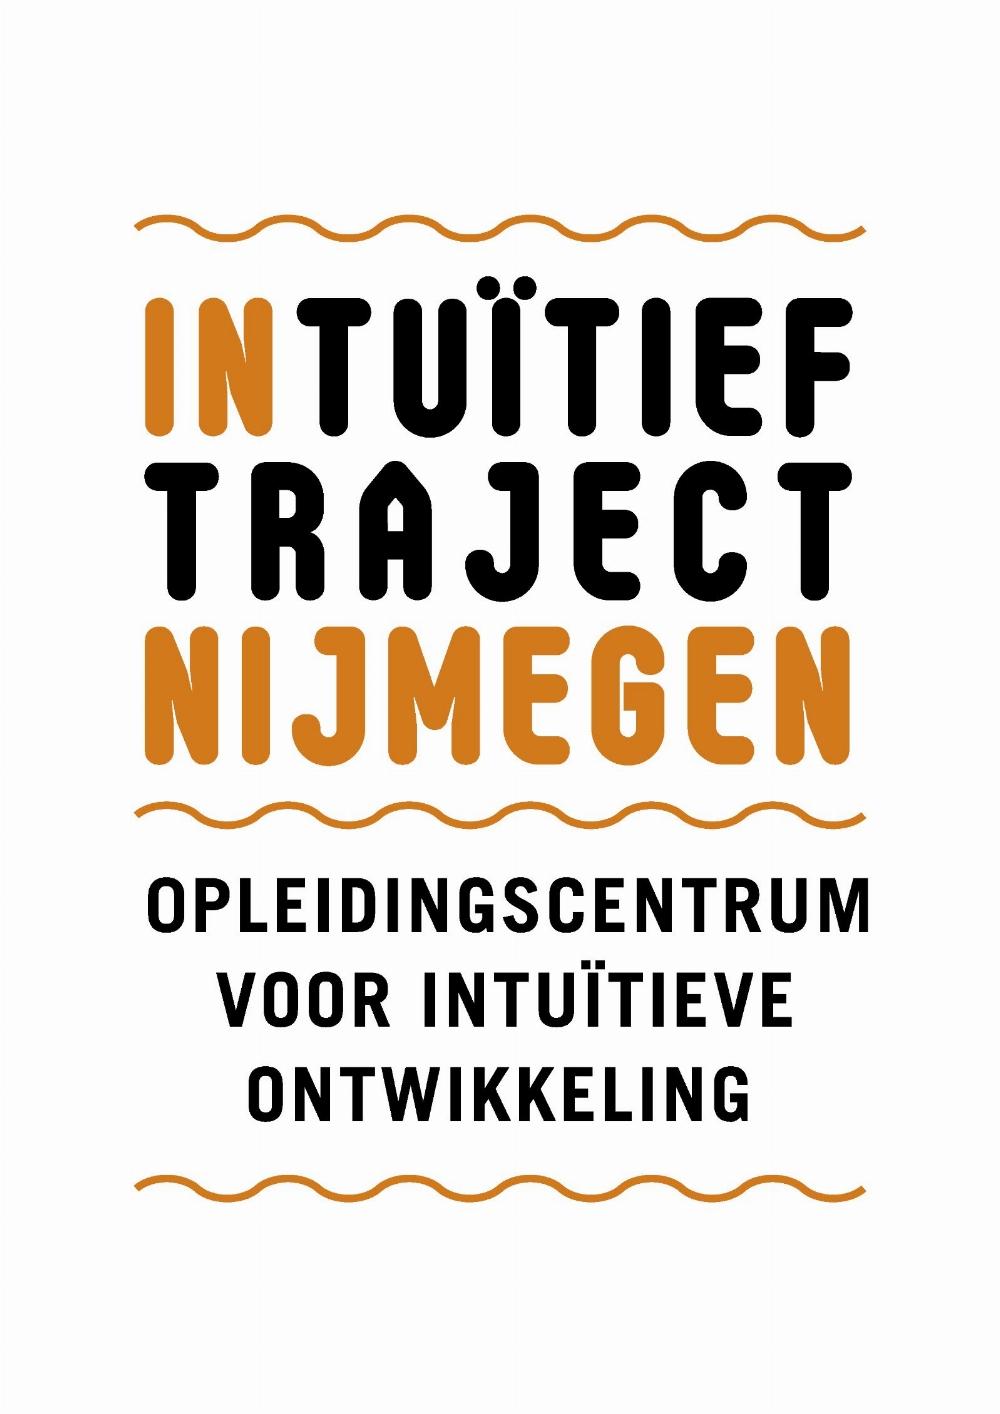 Intuïtief Traject